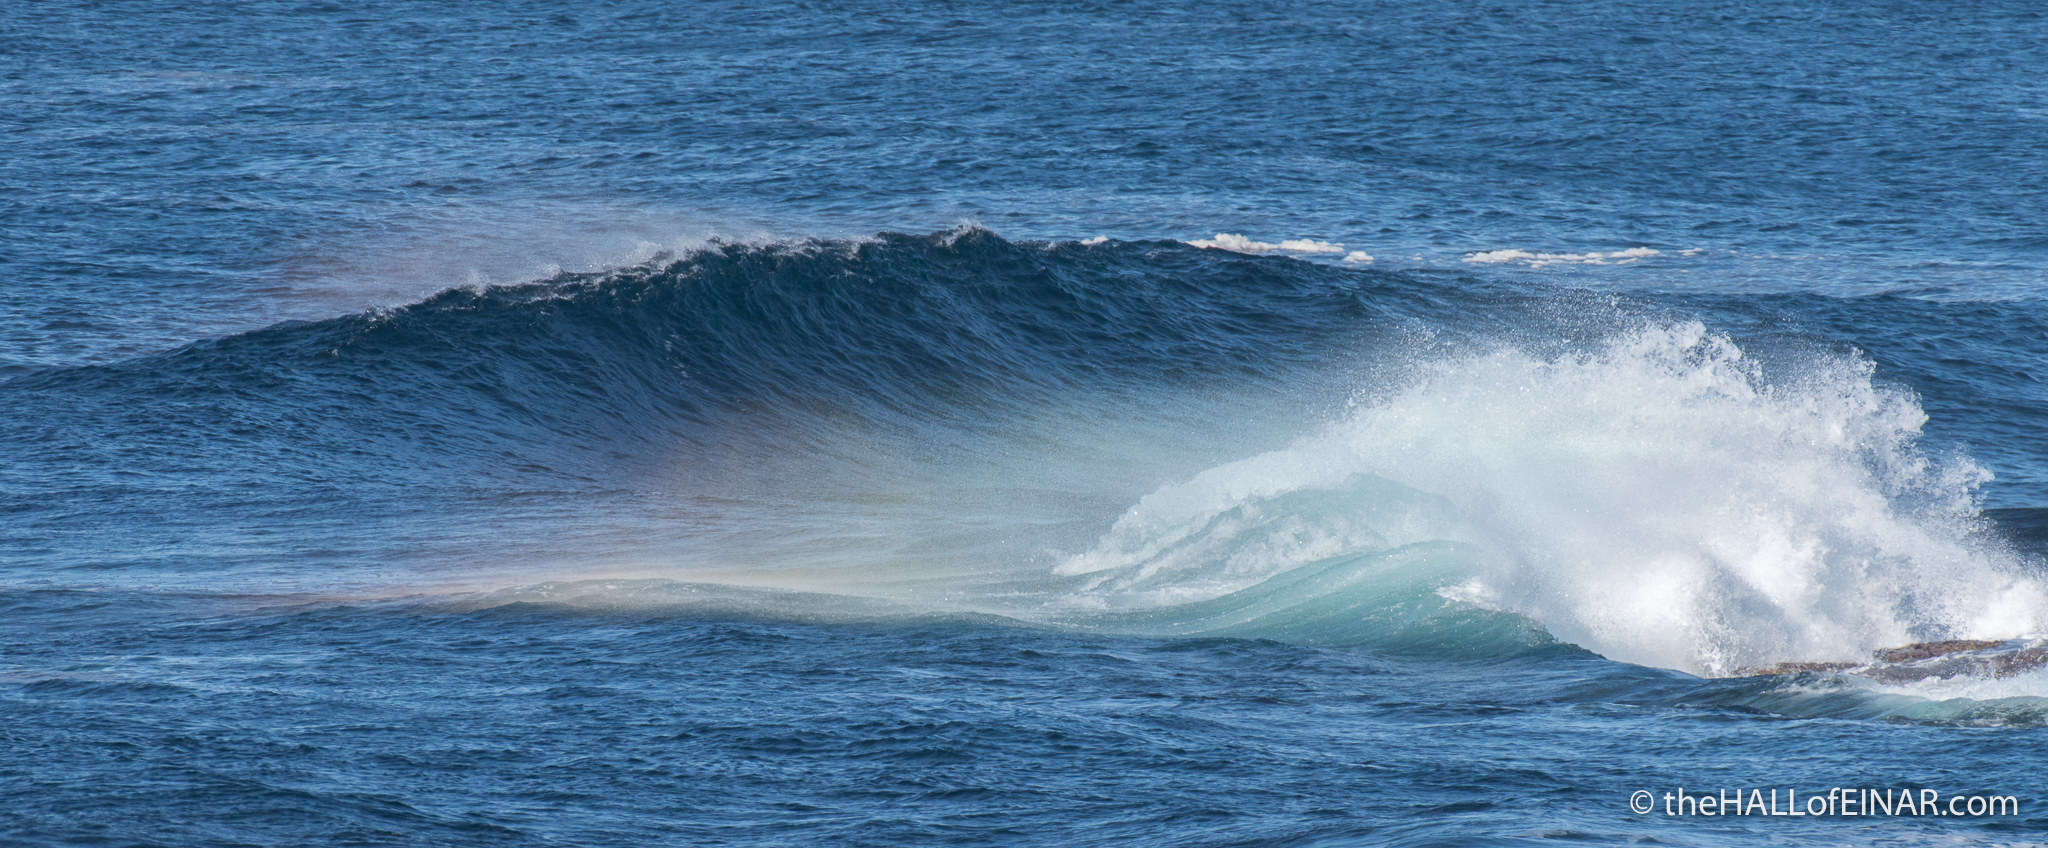 Rainbow Wave - The Hall of Einar - photograph (c) David Bailey (not the)